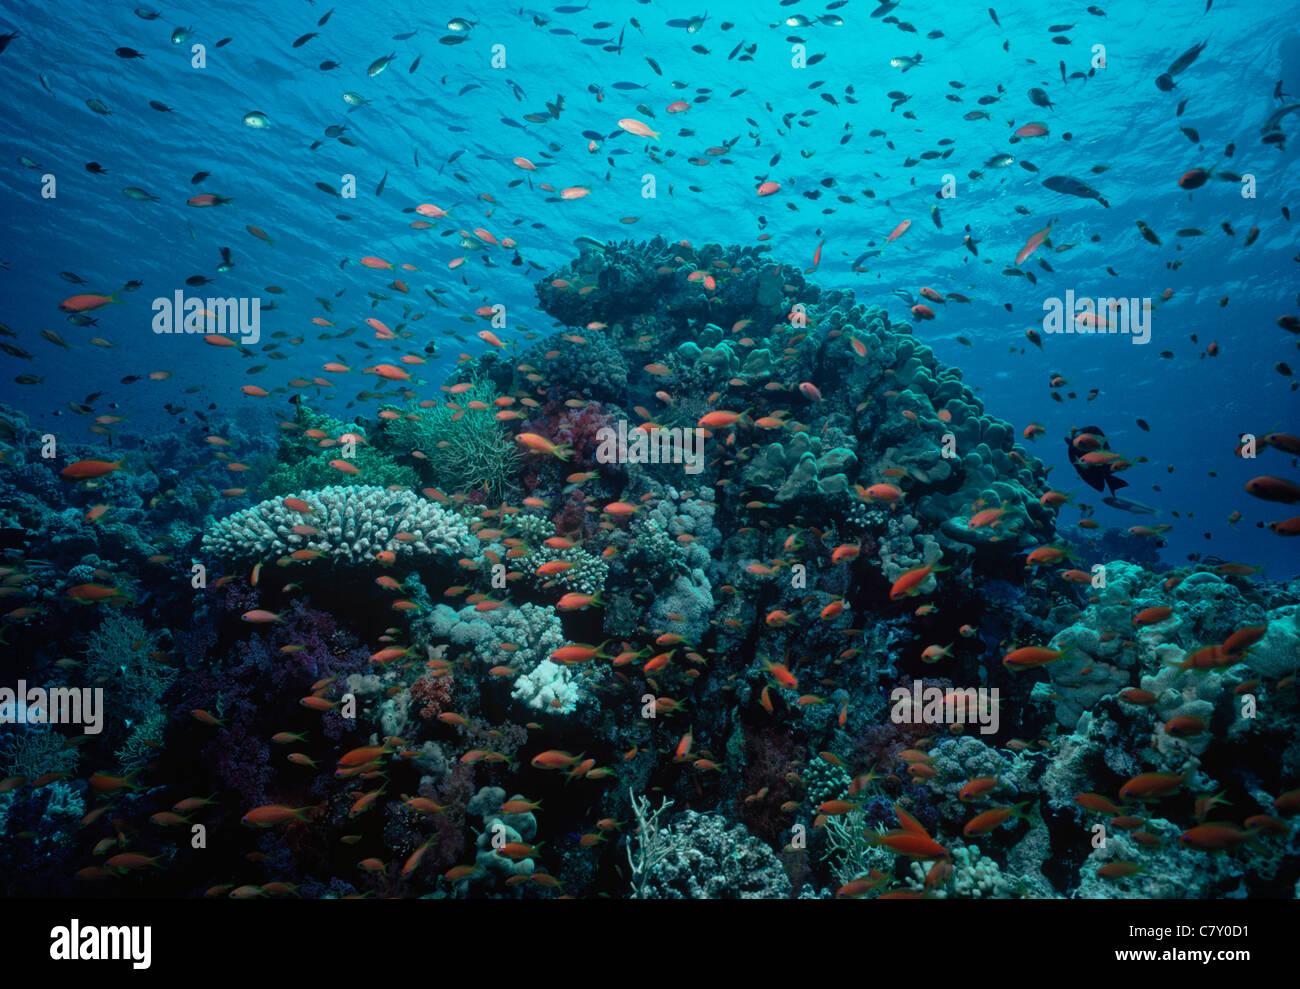 Scalefin Anthias (Pseudanthias squamipinnis) schooling on coral reef. Egypt - Red Sea - Stock Image